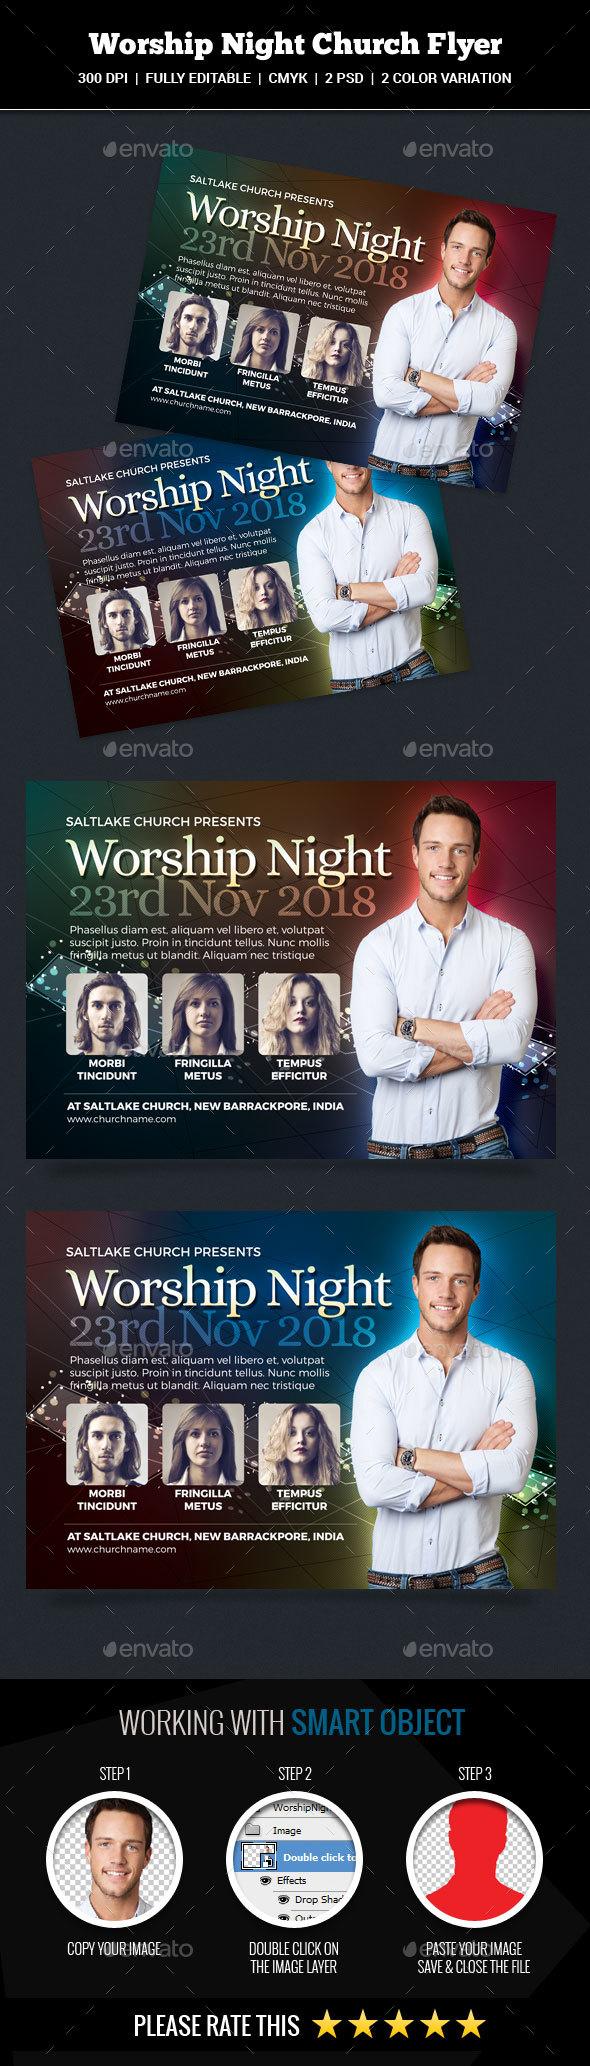 Worship Night Church Flyer - Church Flyers